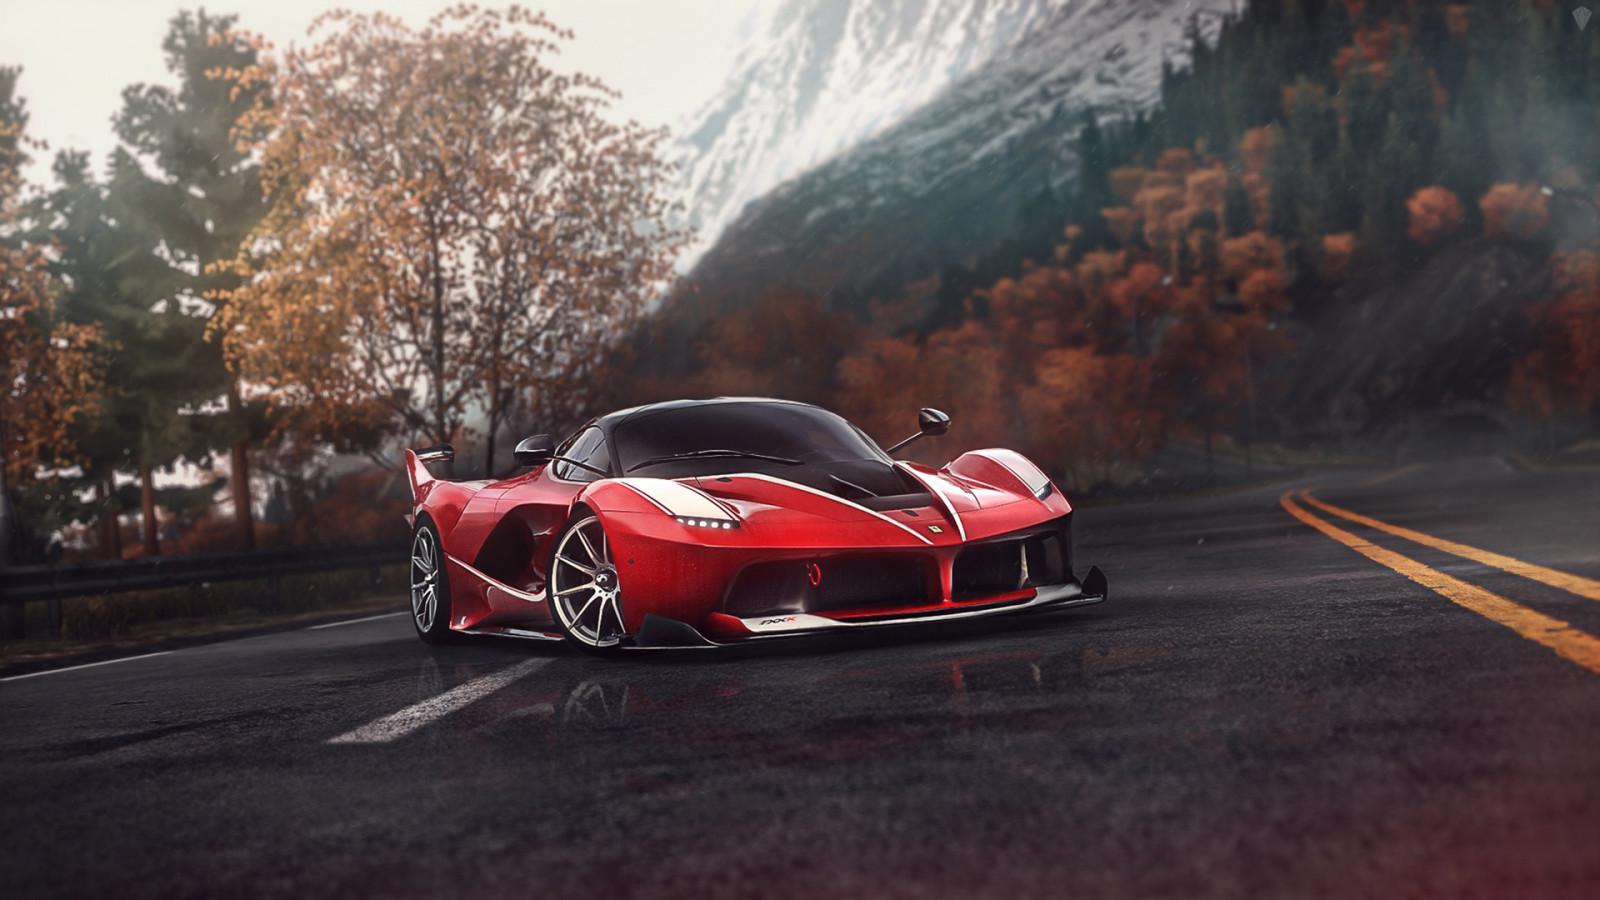 View Ferrari Fxx K Wallpaper Hd 88  Images